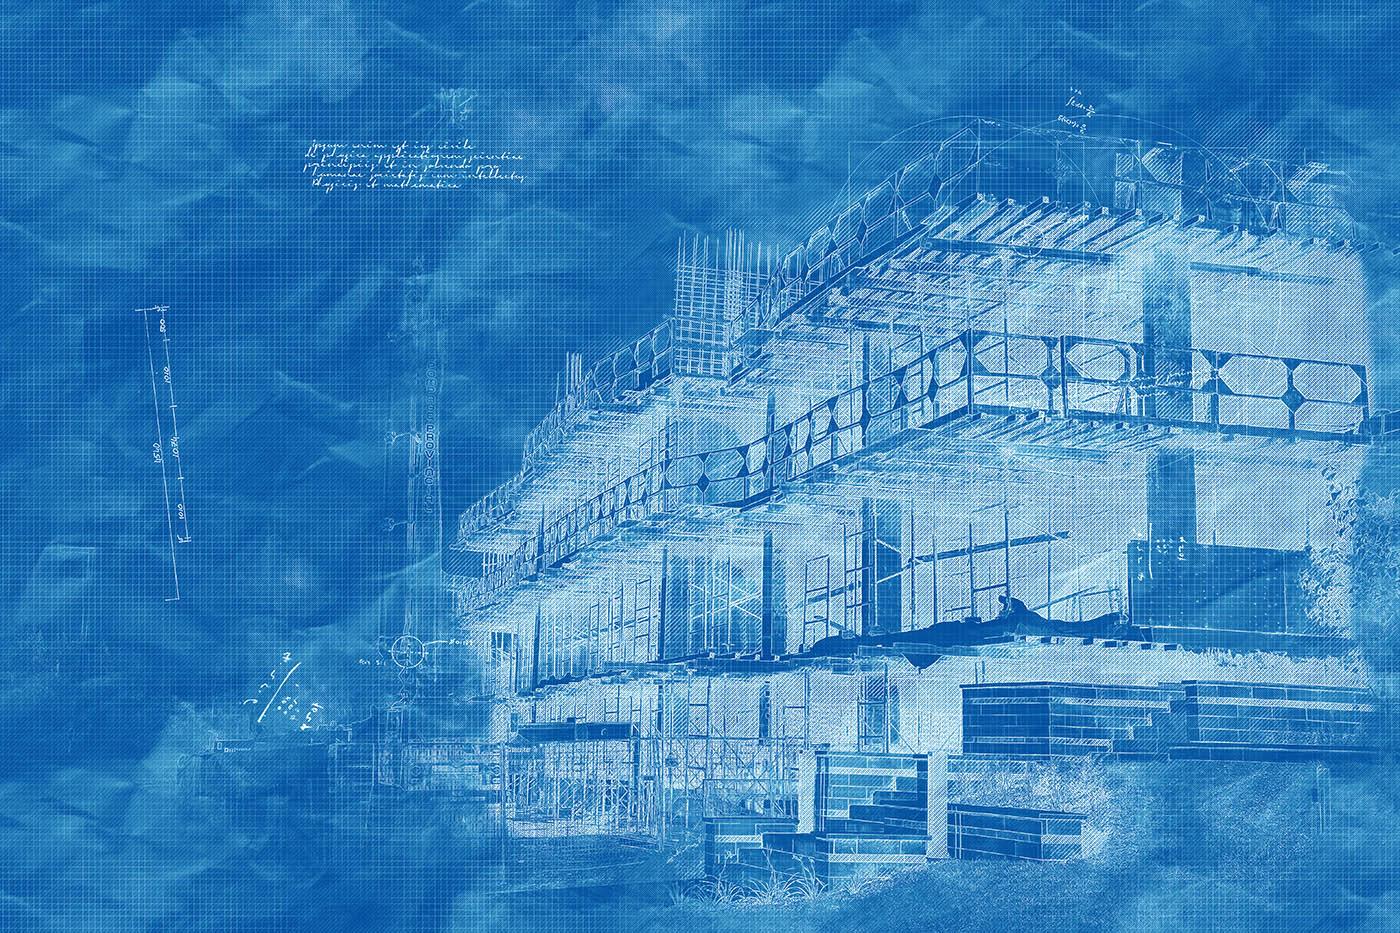 Construction Project Blueprint Sketch Image - Stock Photo